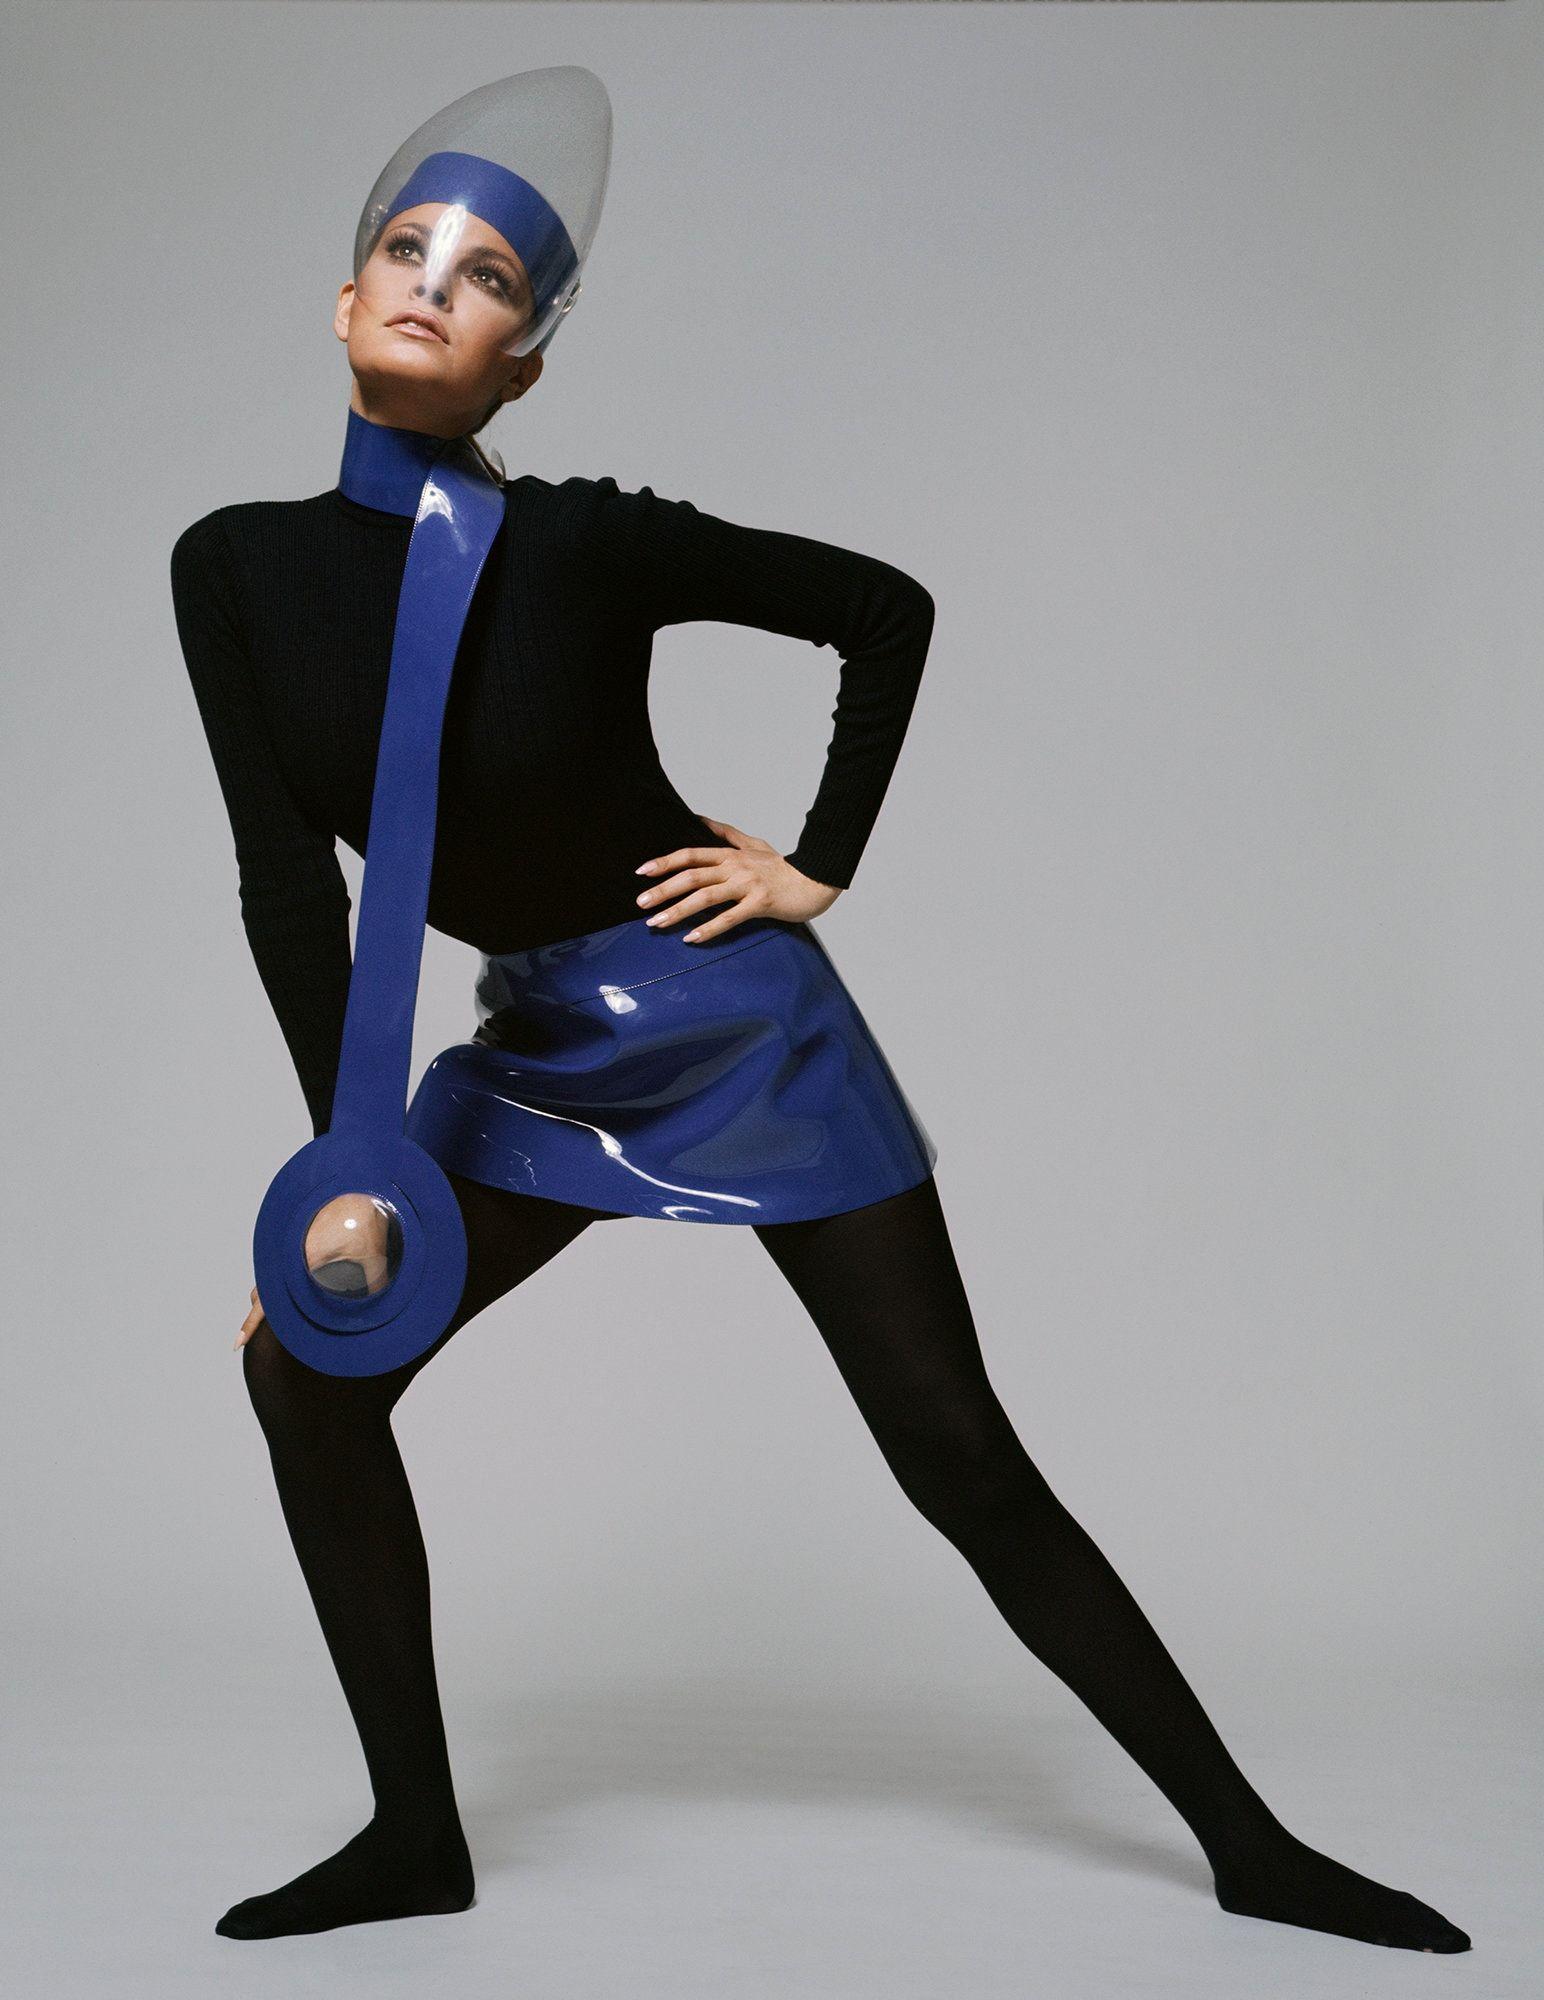 Pierre Cardin S Space Age Fashion Takes Us Back To The Future Published 2019 Future Fashion Pierre Cardin Fashion